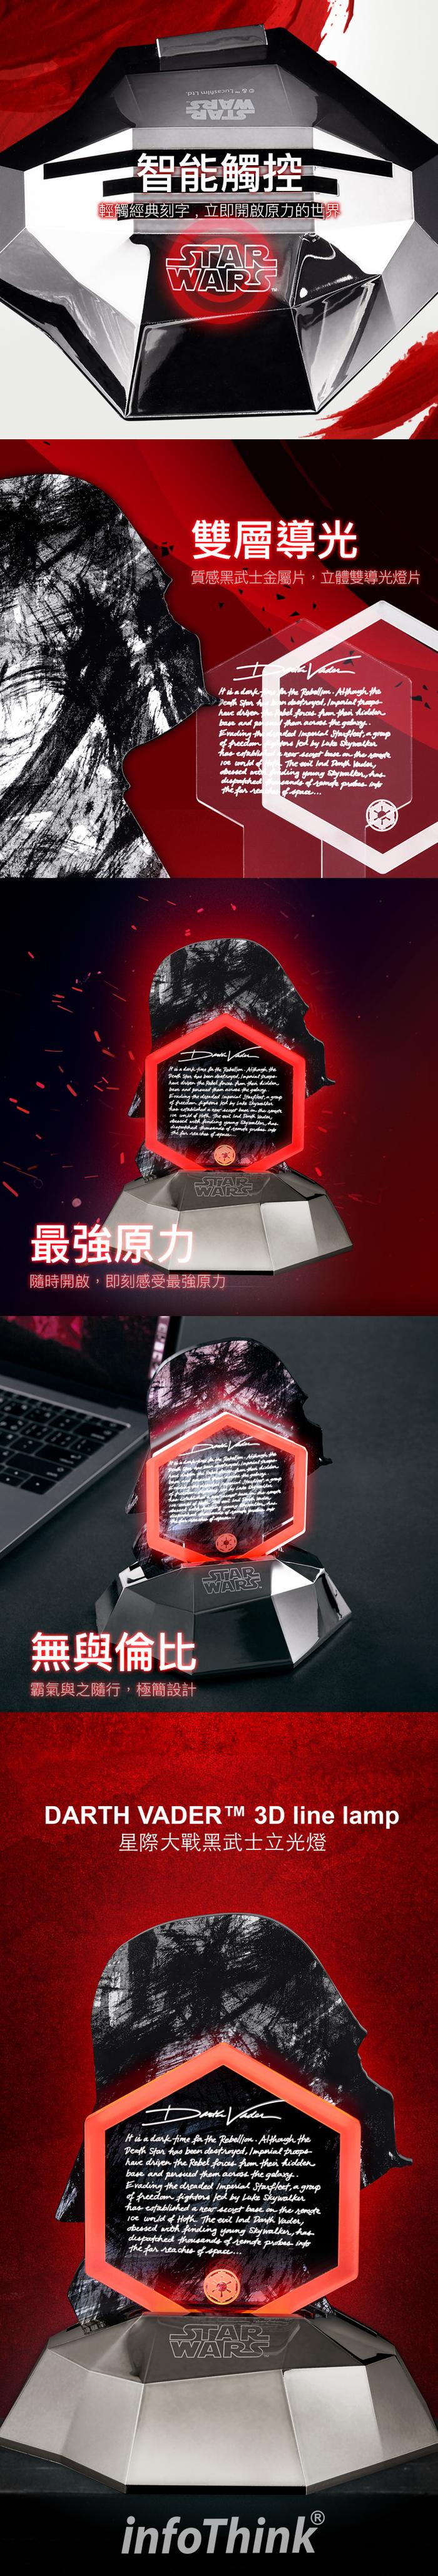 InfoThink (限量收藏版)星際大戰黑武士3D立光燈